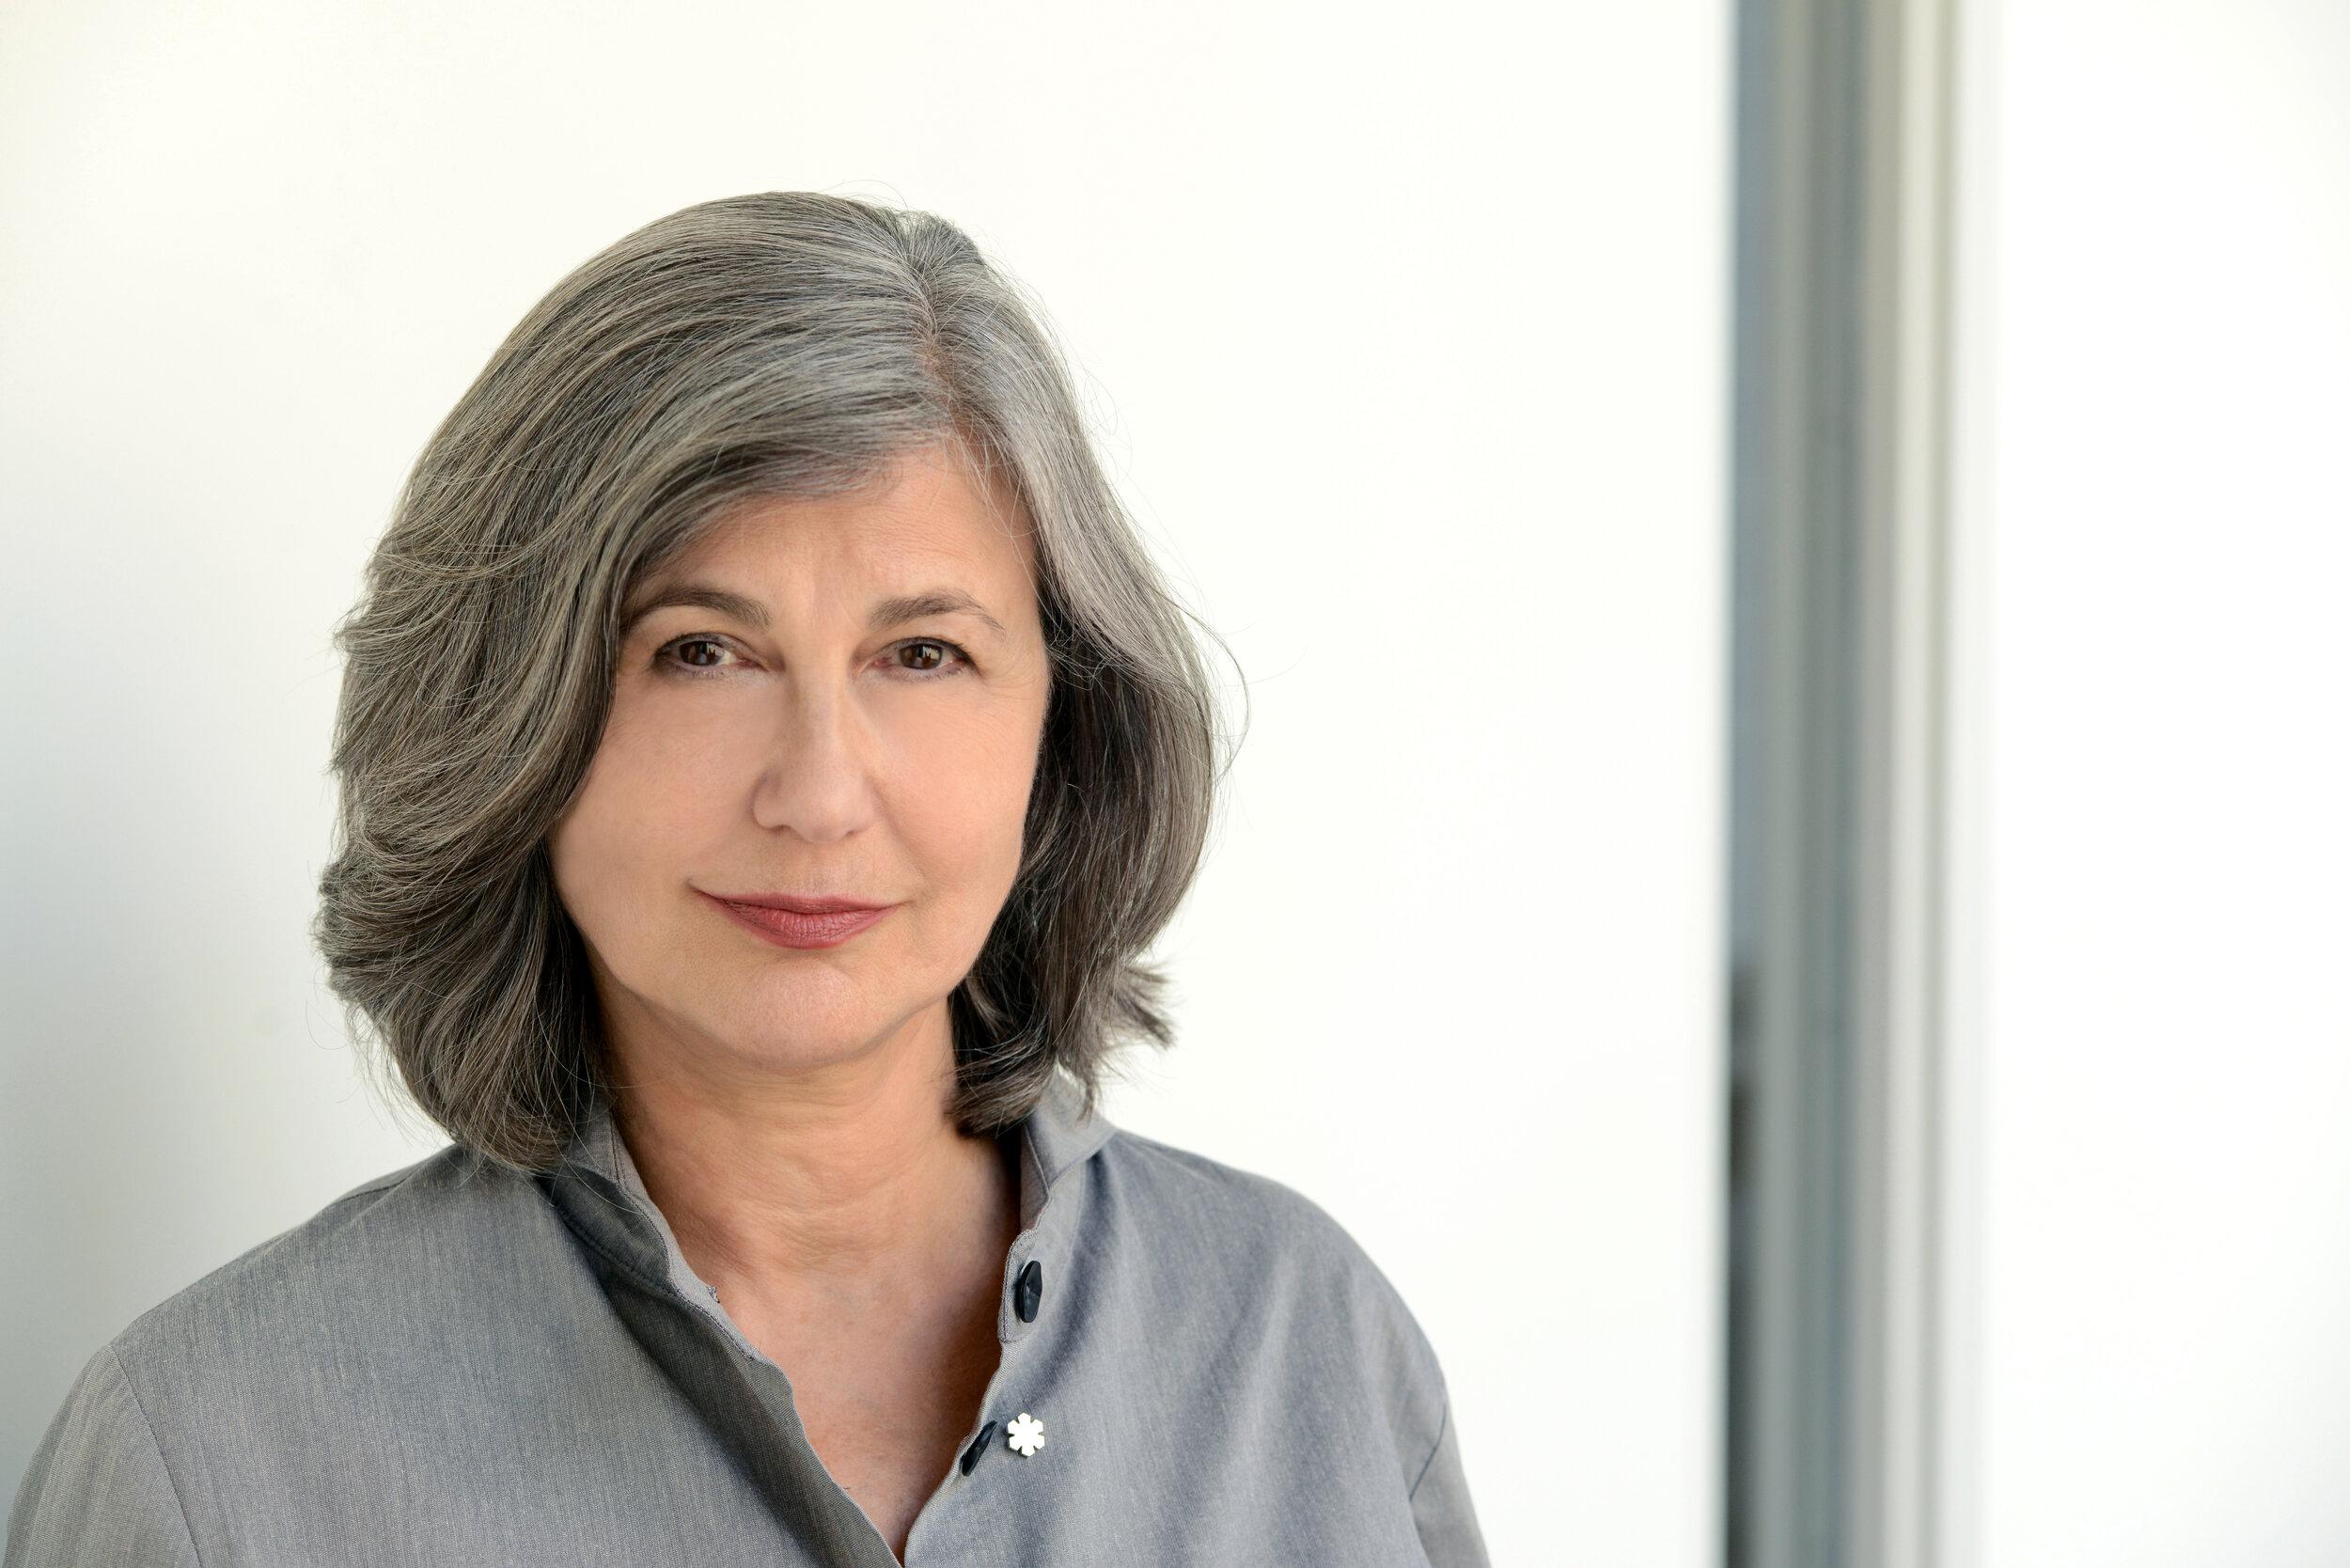 Shirley Blumberg - CM, OAA, FRAIC, AIA